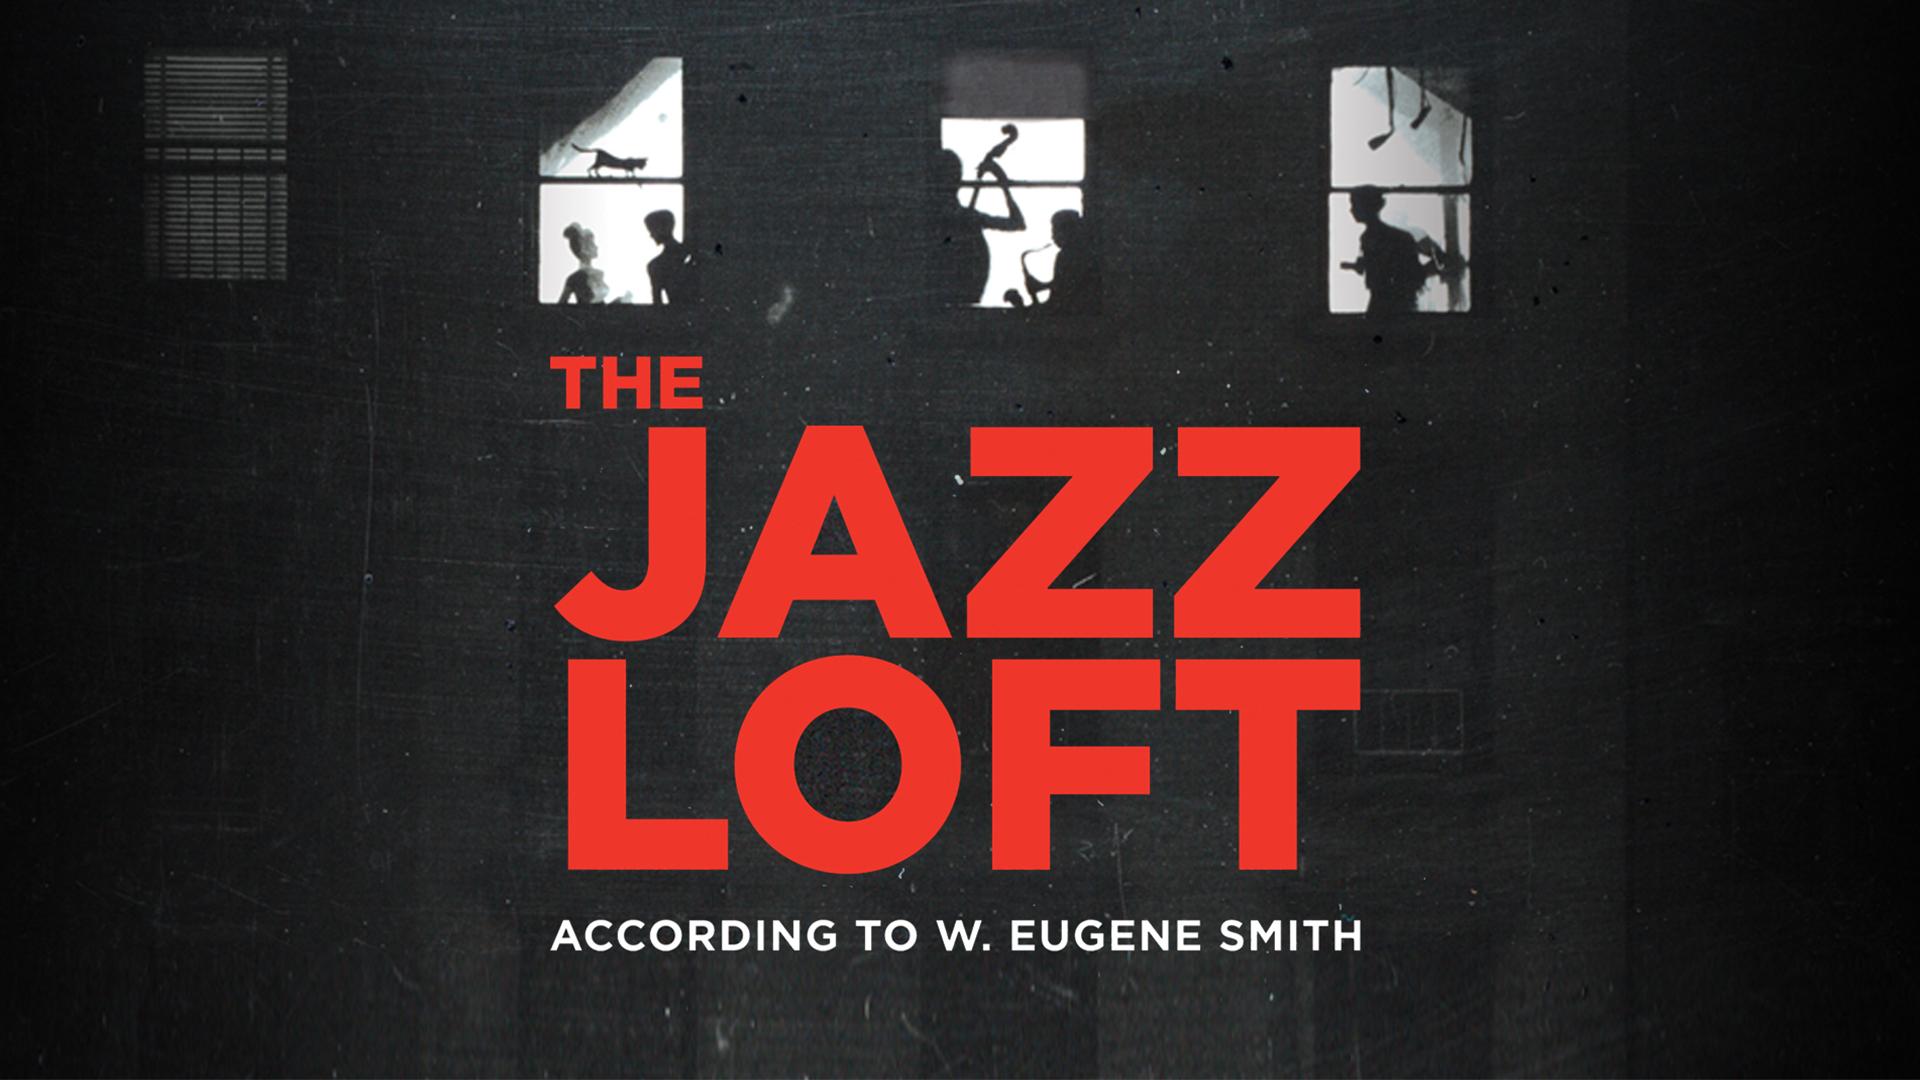 The Jazz Loft According to W. Eugene Smith